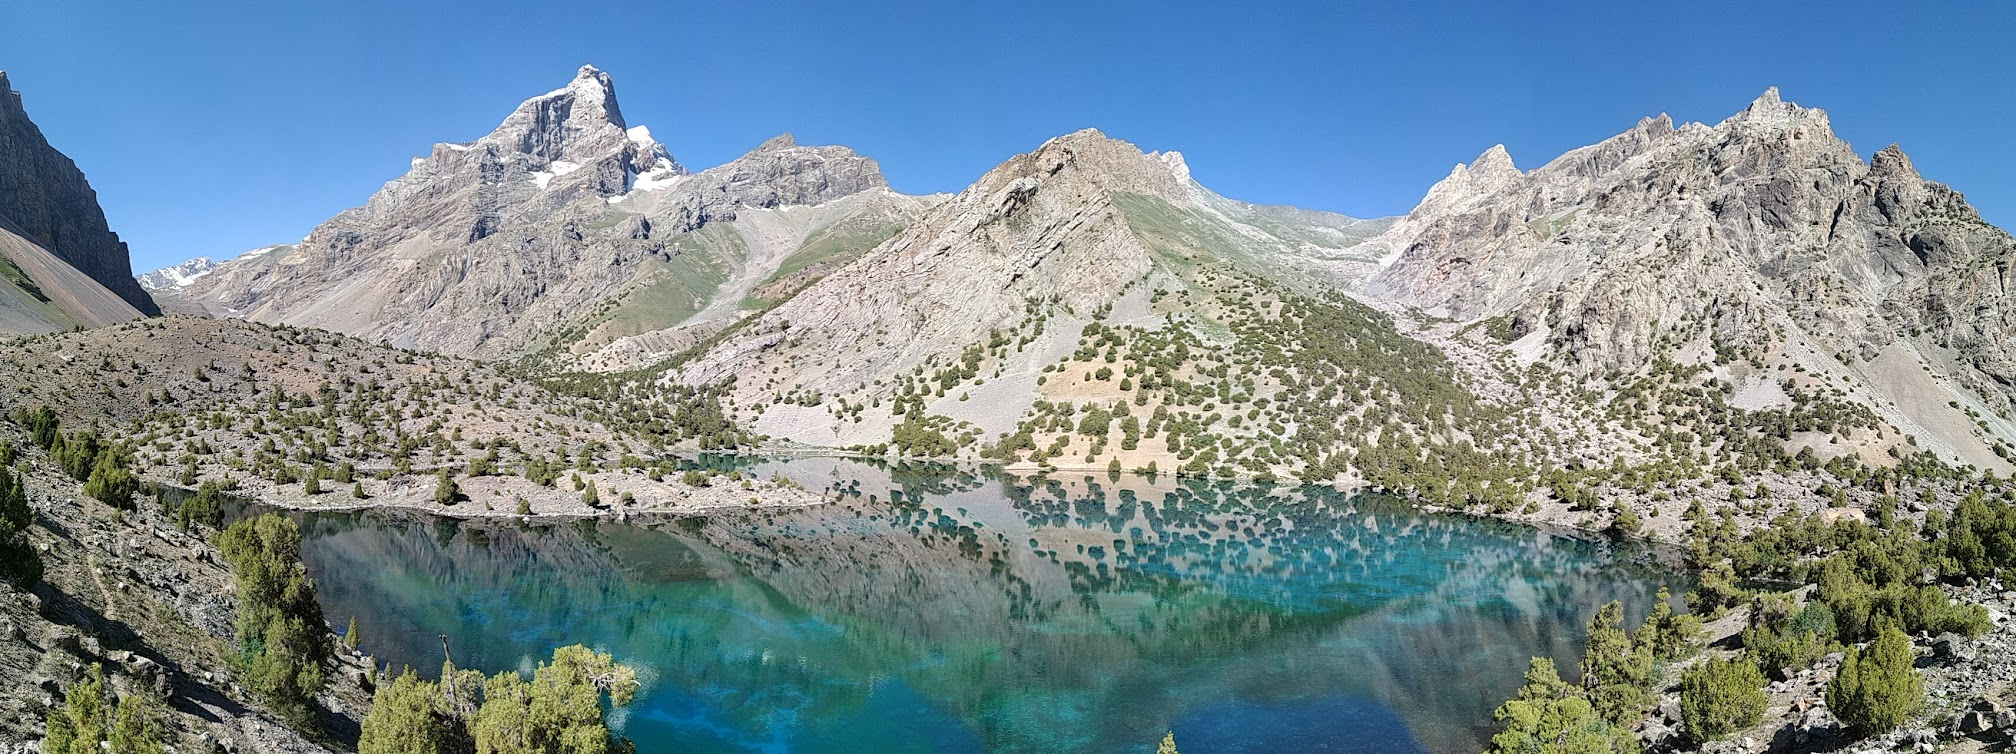 Fann mountains - Kulikalon lakes, part 1 - Jul 19